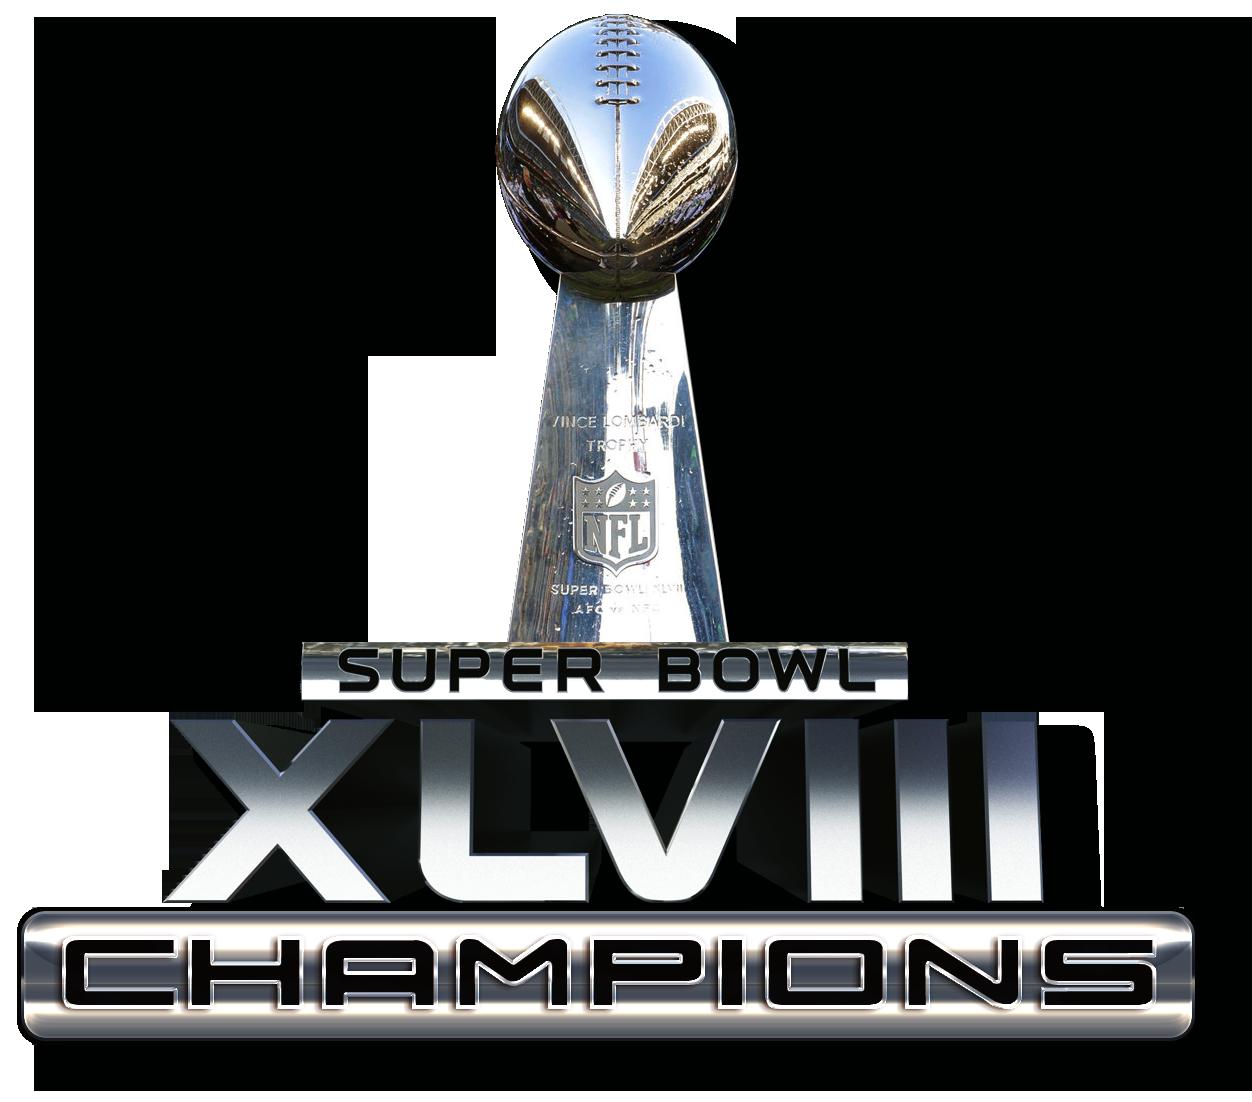 Super Bowl Trophy Clipart Free Download Best